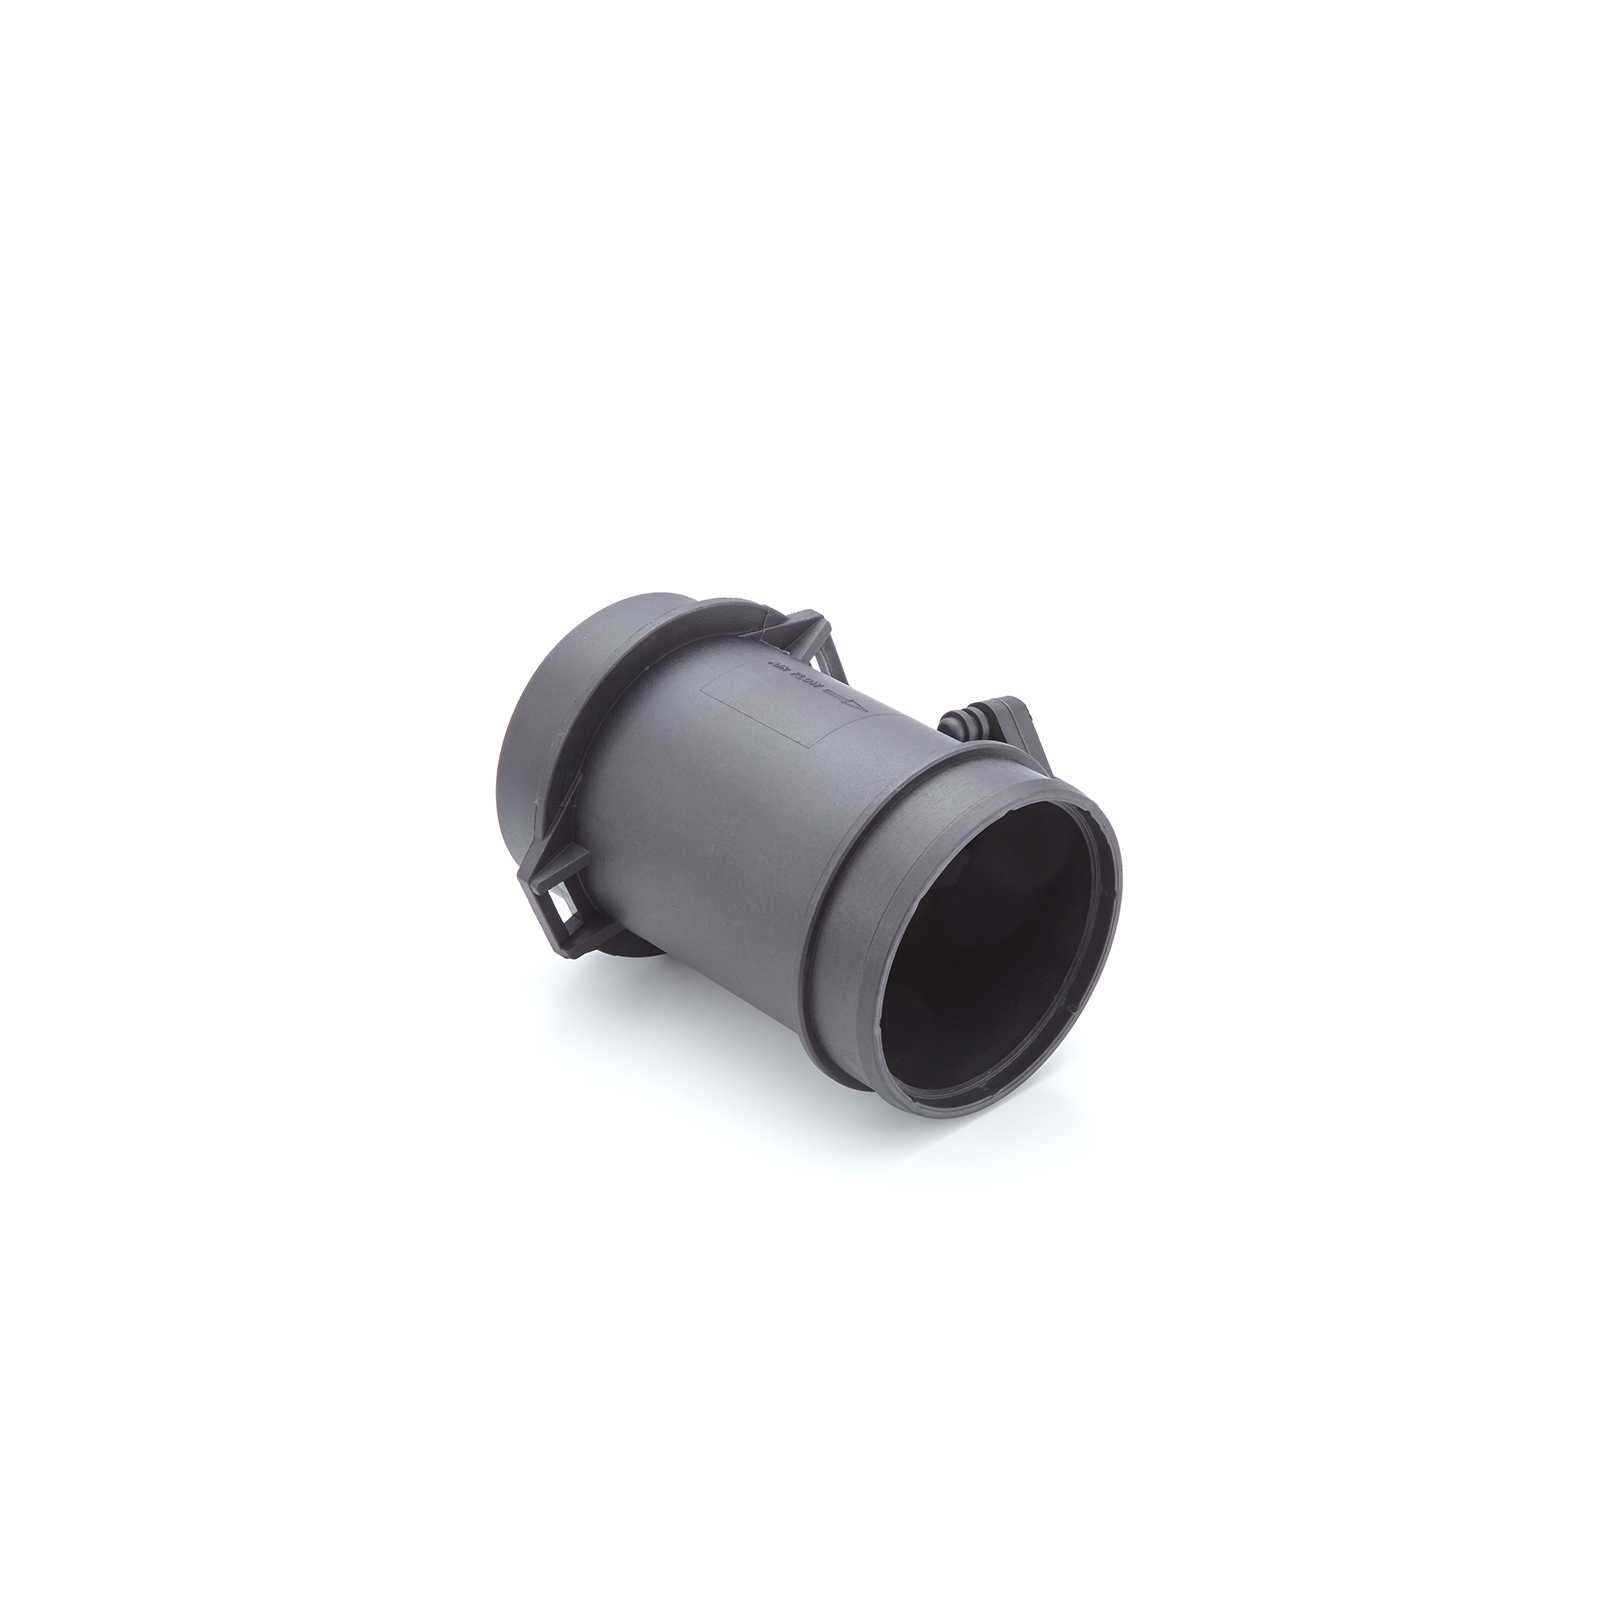 Mass-Air-Flow-Meter-Sensor-For-Honda-MG-Rover-Ferrari Indexbild 6